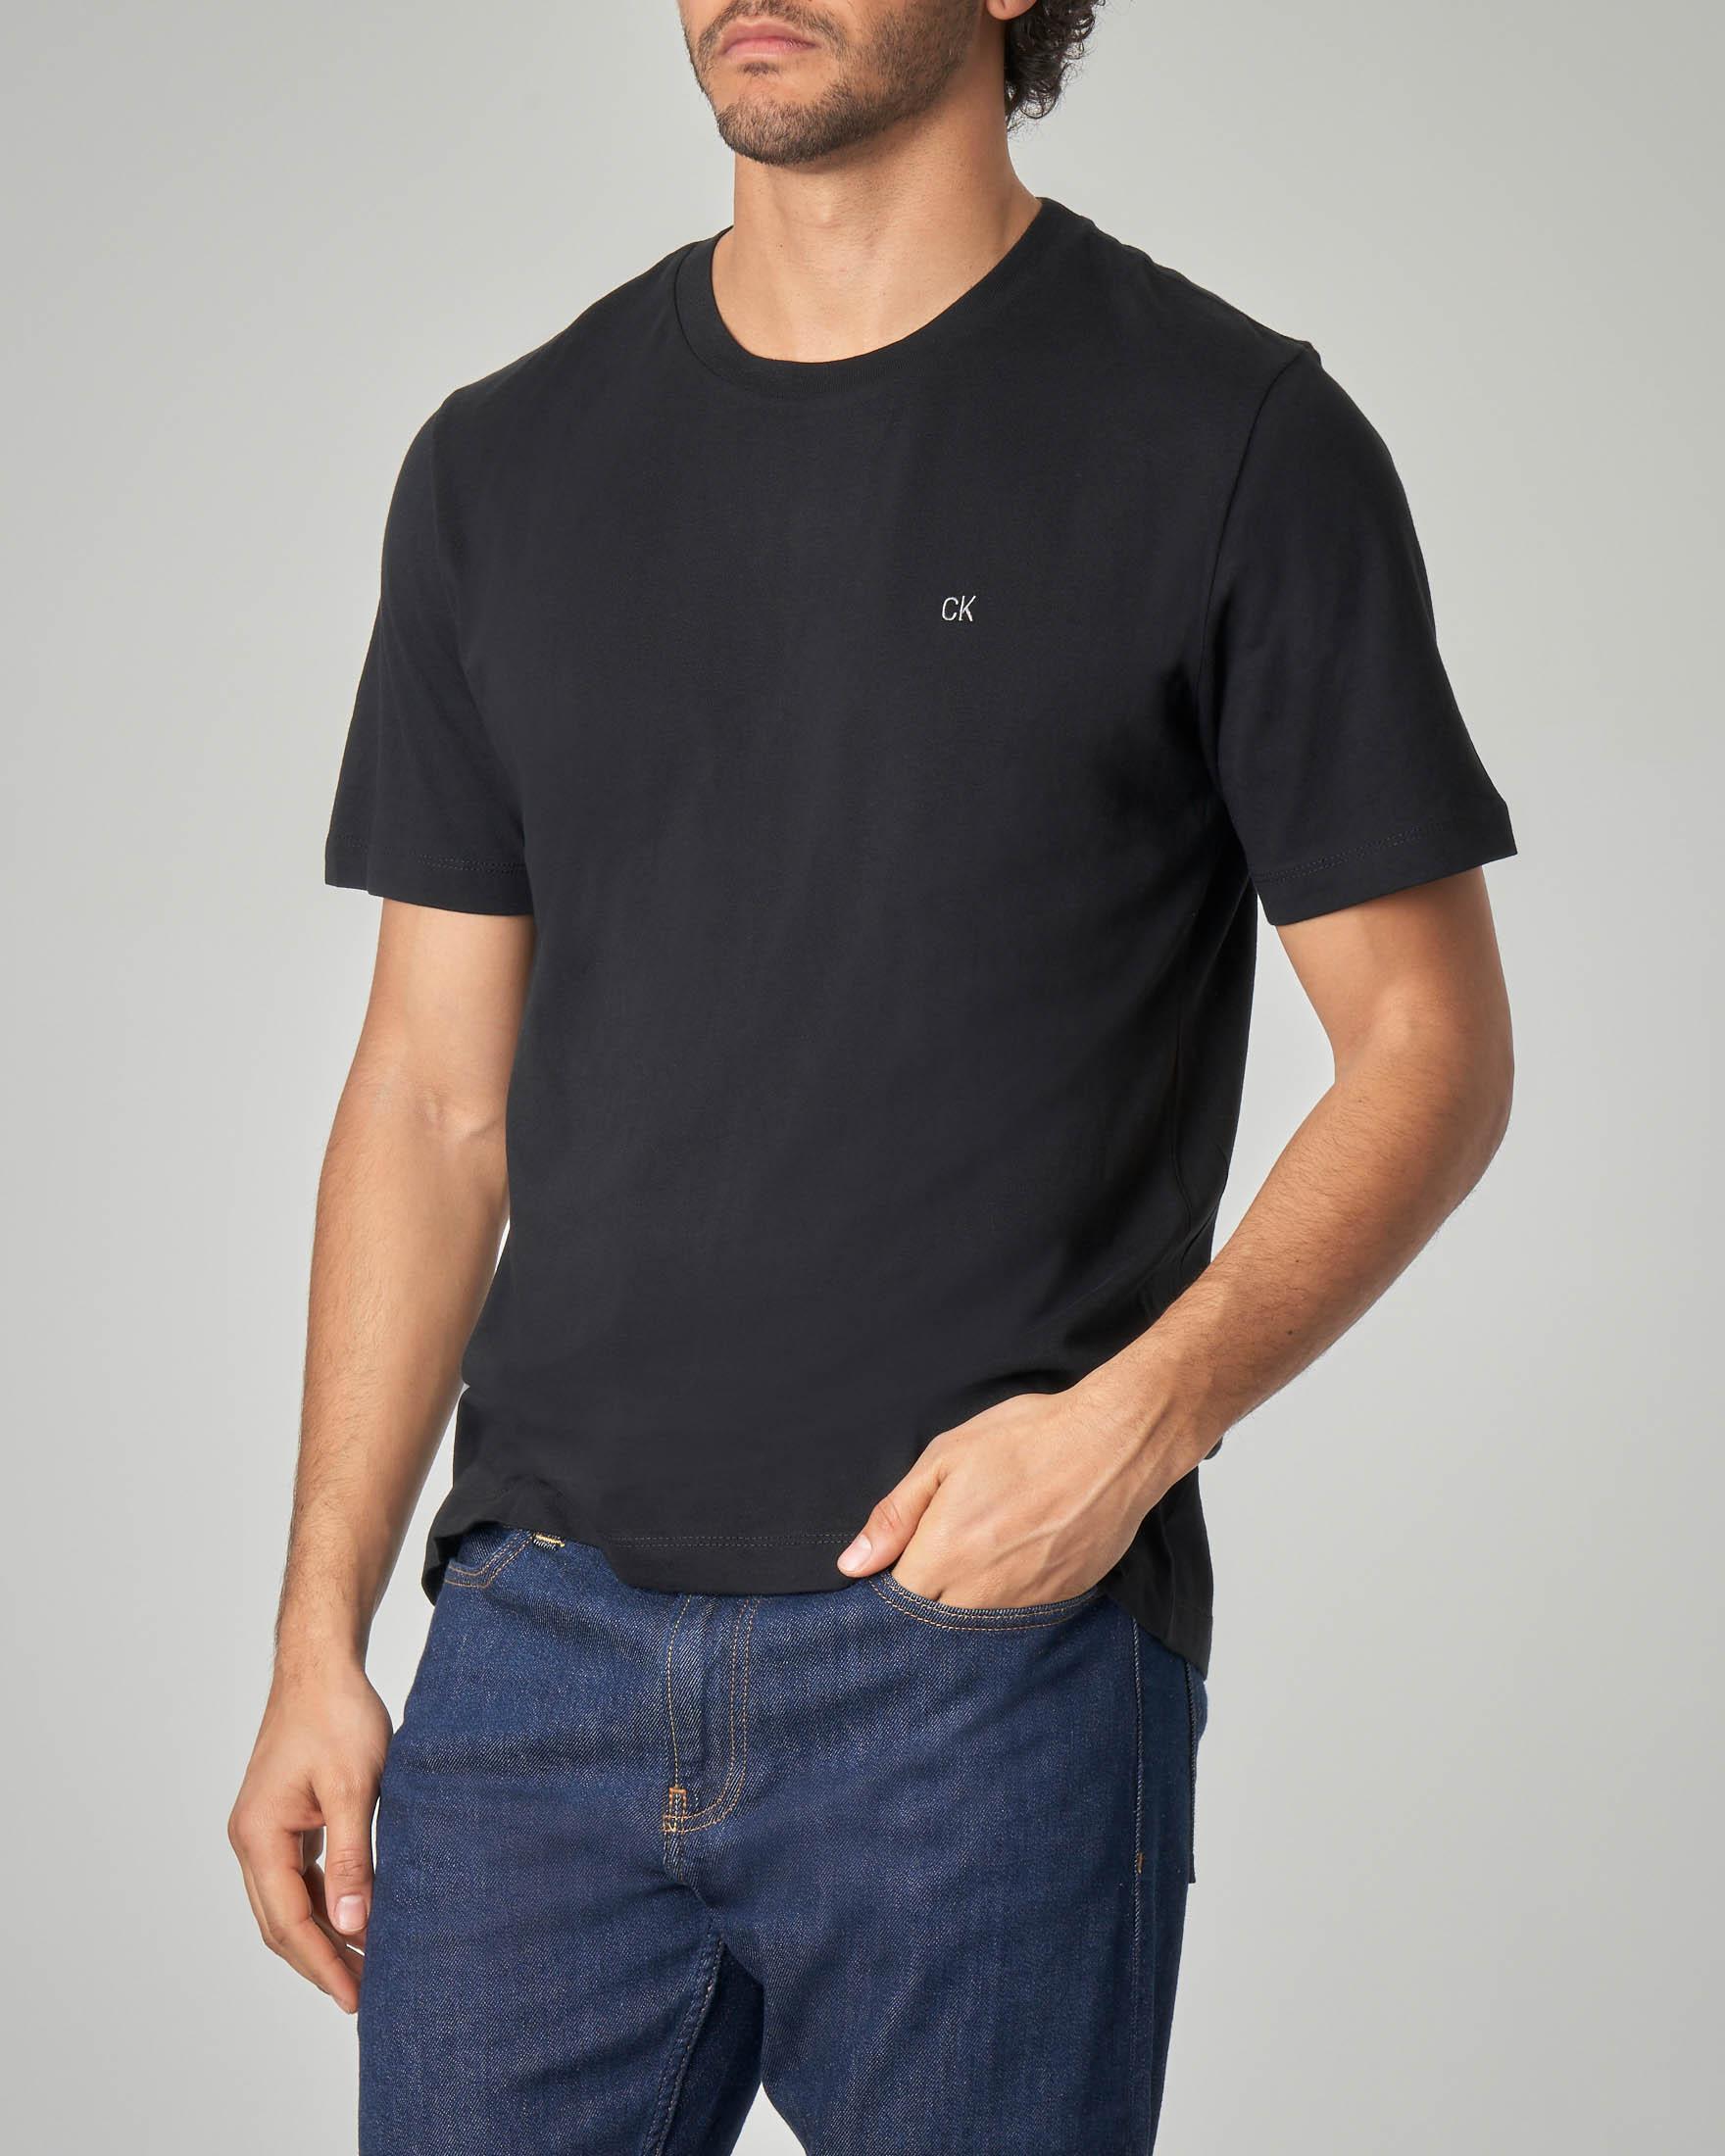 T-shirt nera con logo CK